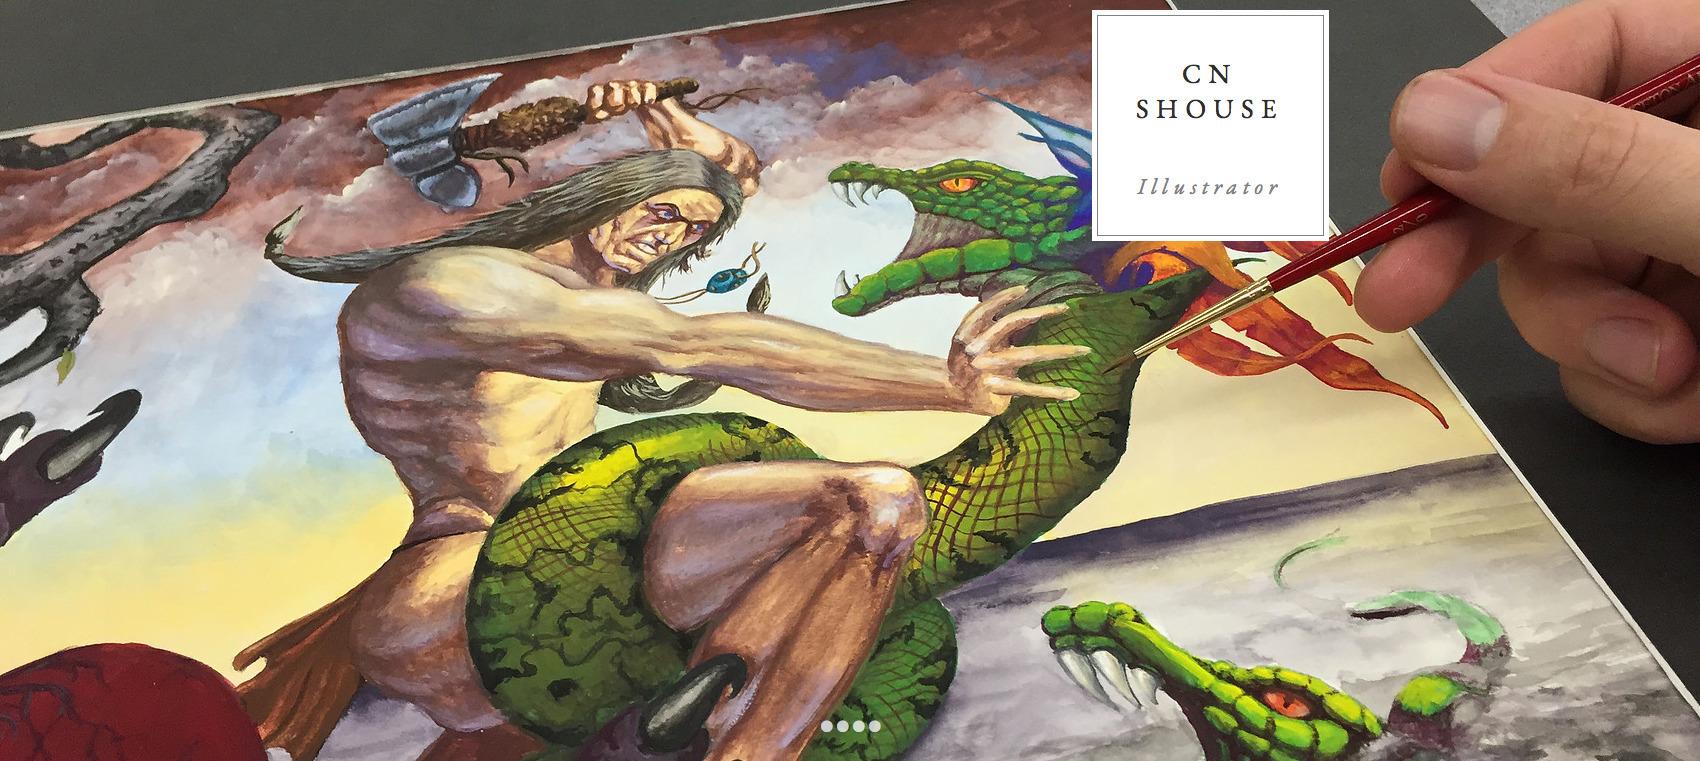 Chris S (@cnshouse) Cover Image